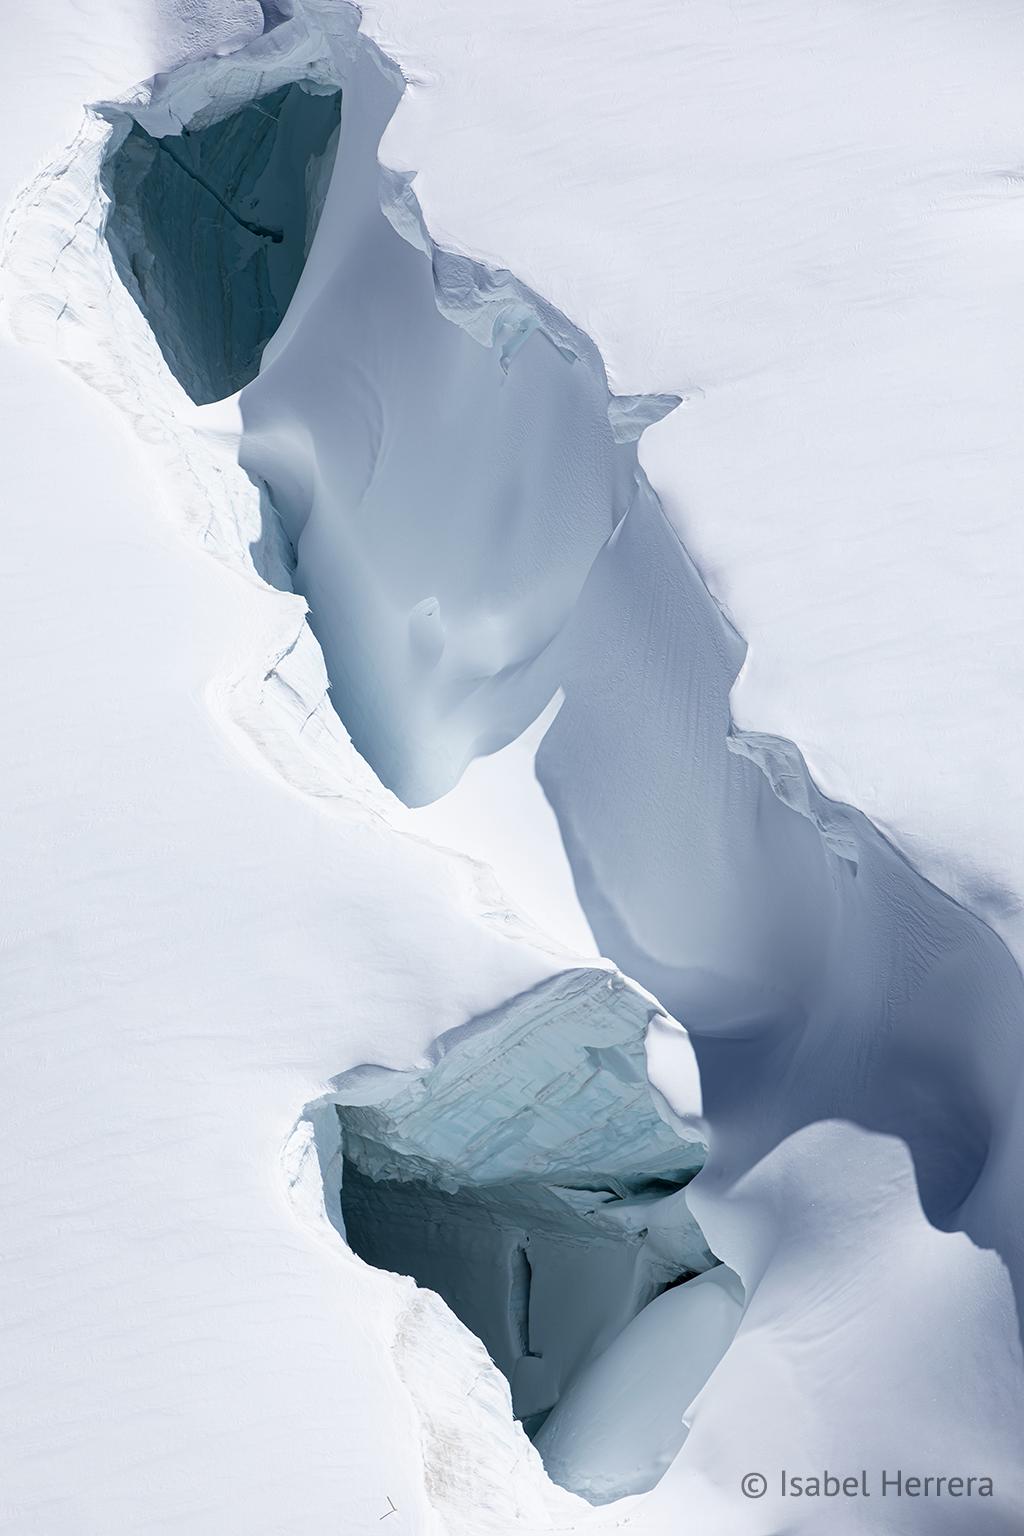 Jungfrau_2020_11